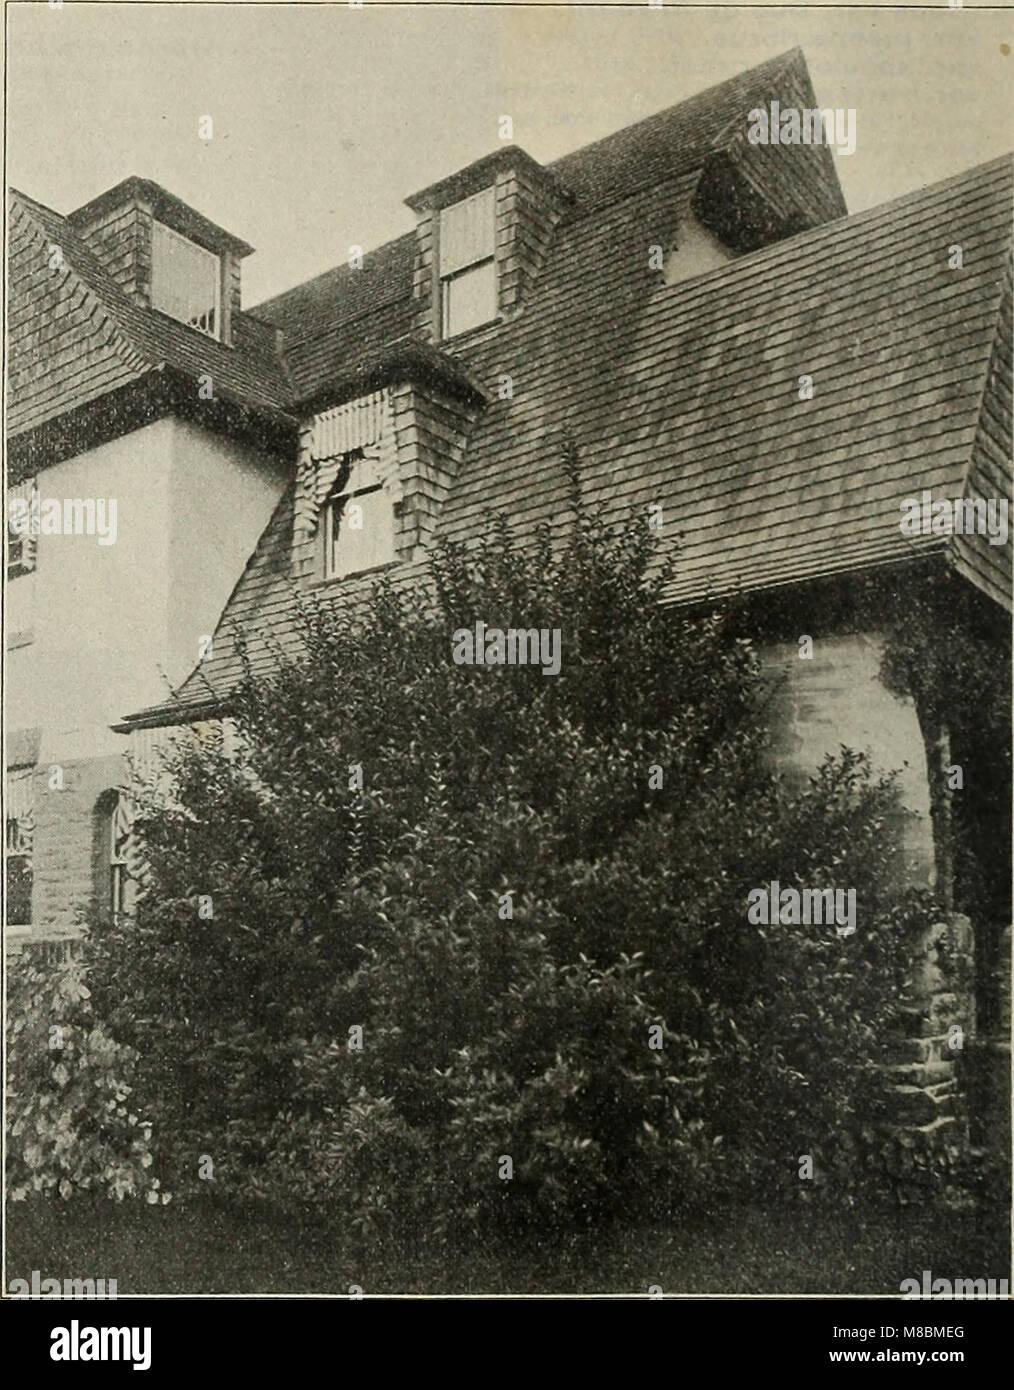 Descriptive catalogue - ornamental trees, shrubs, vines, evergreens, hardy perennials and fruits (1902) (20572112991) Stock Photo